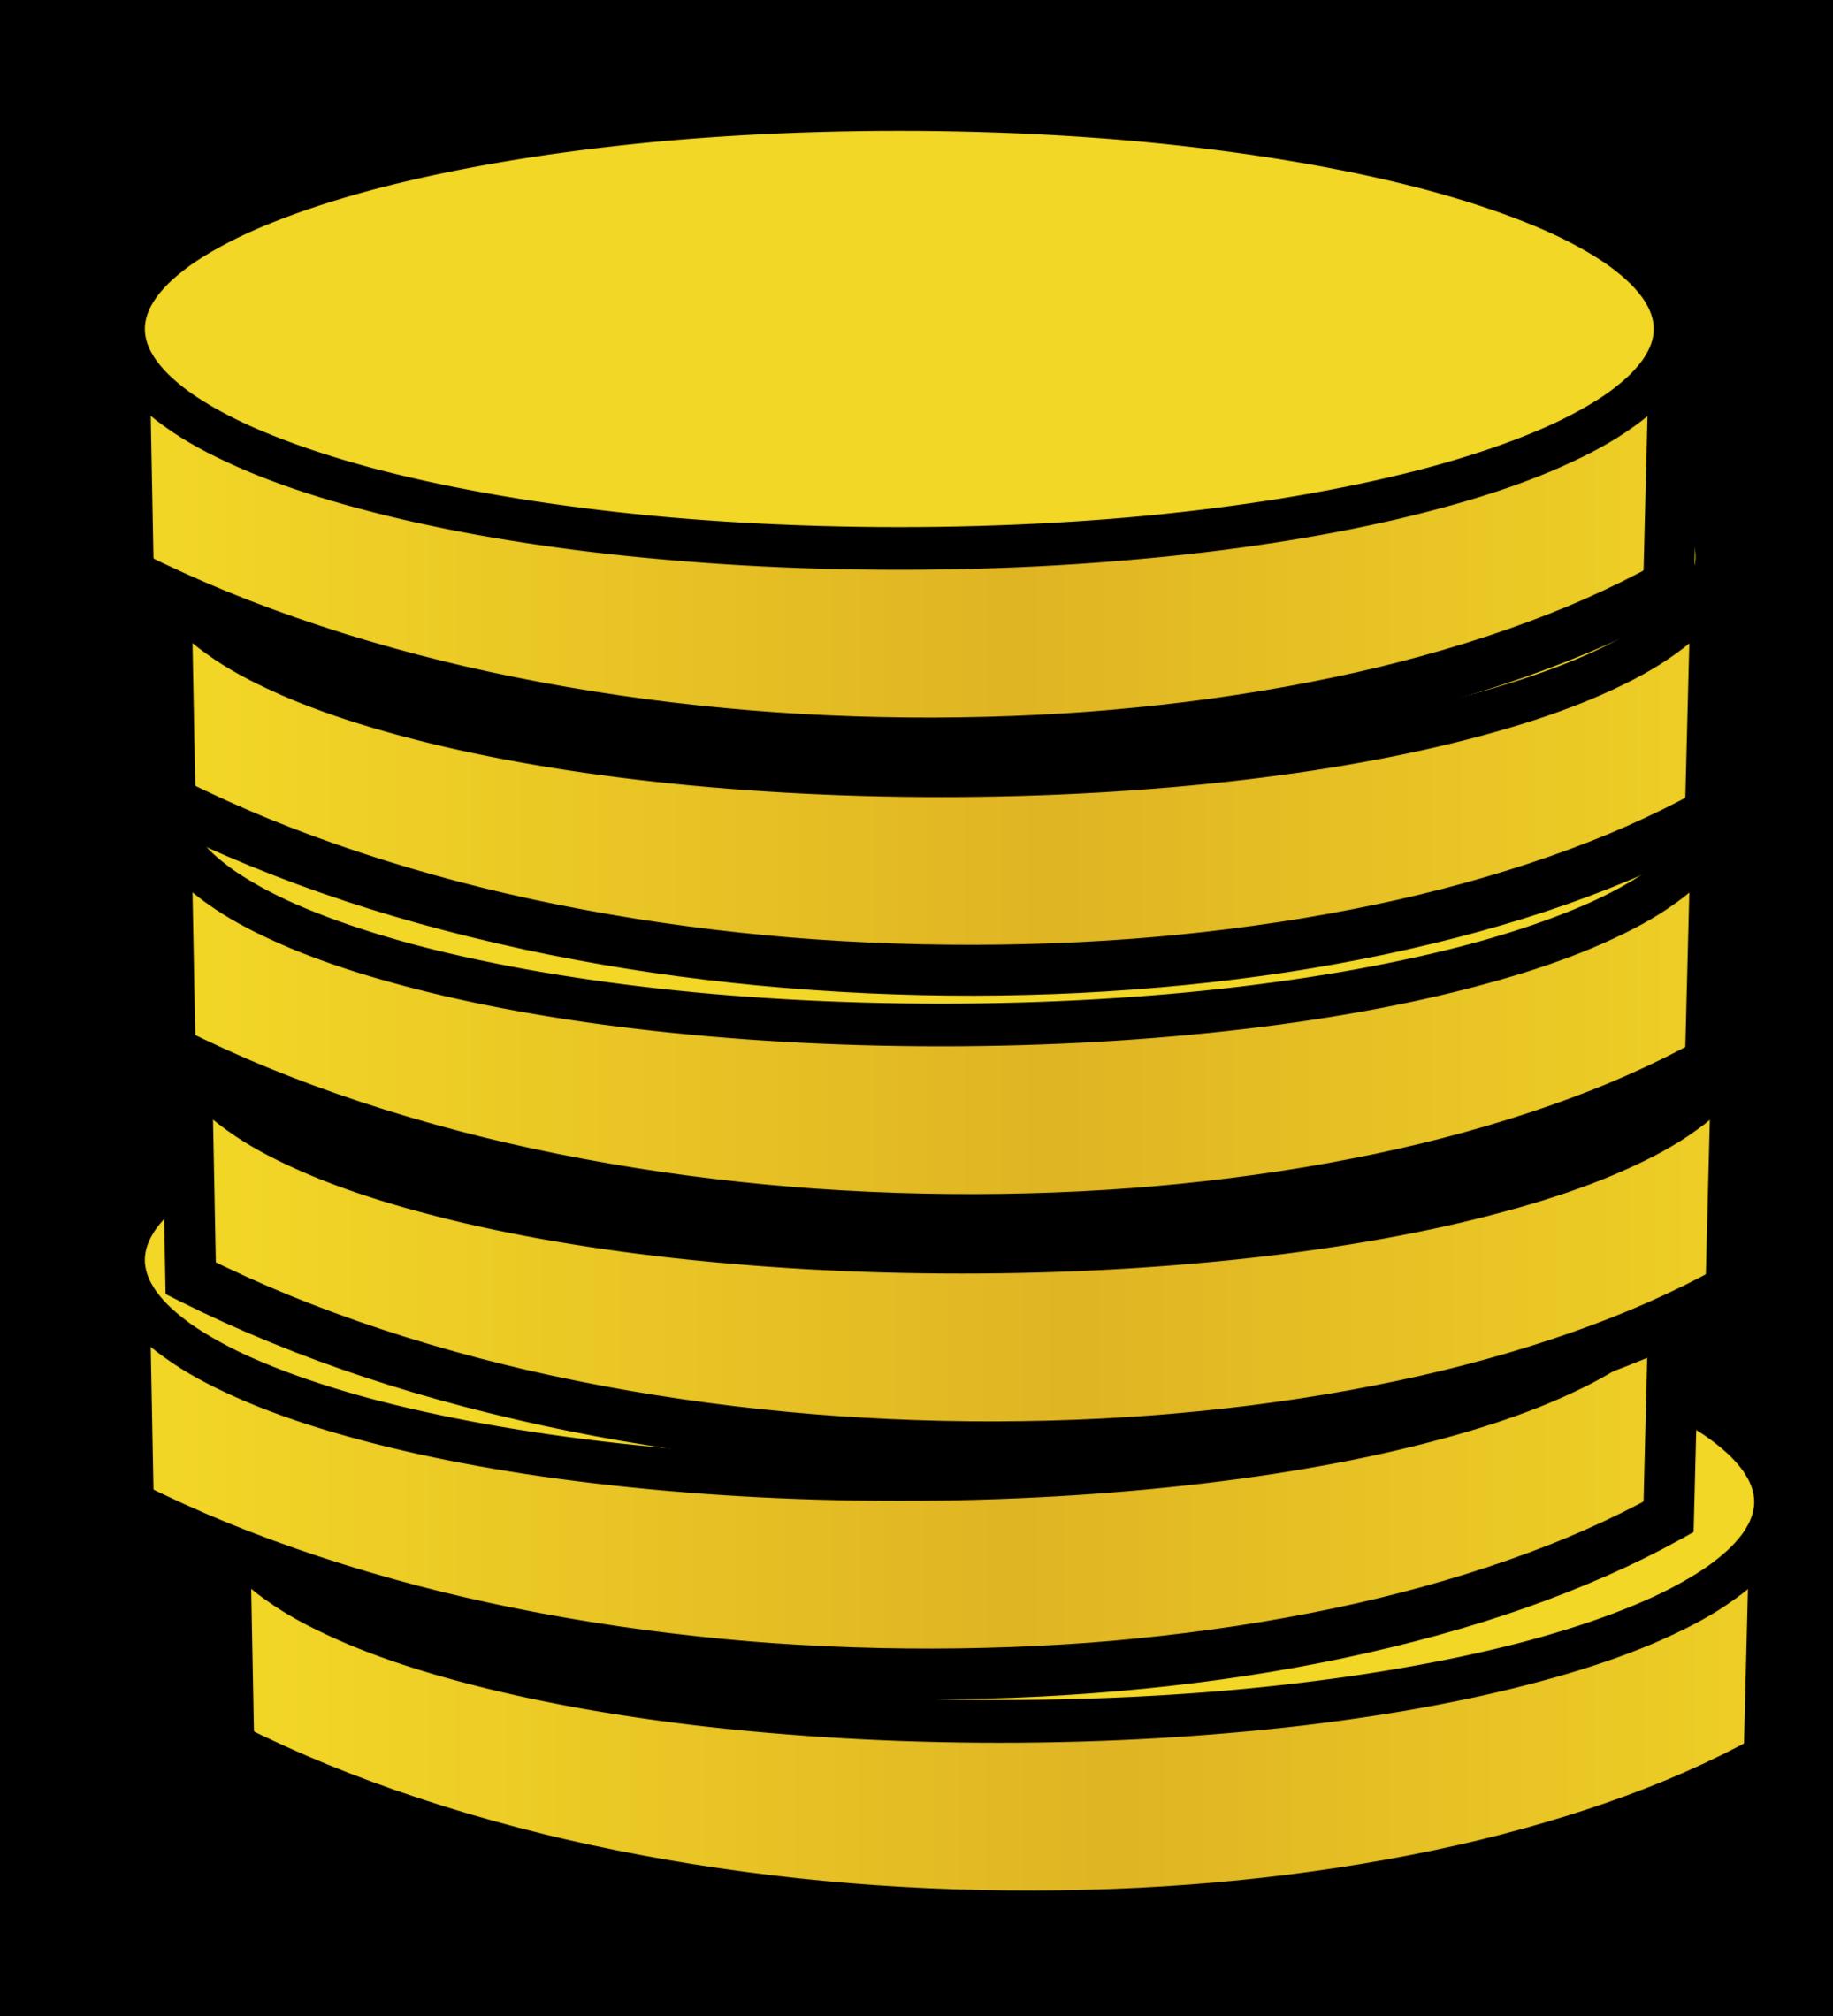 Clip Art Of Coins.